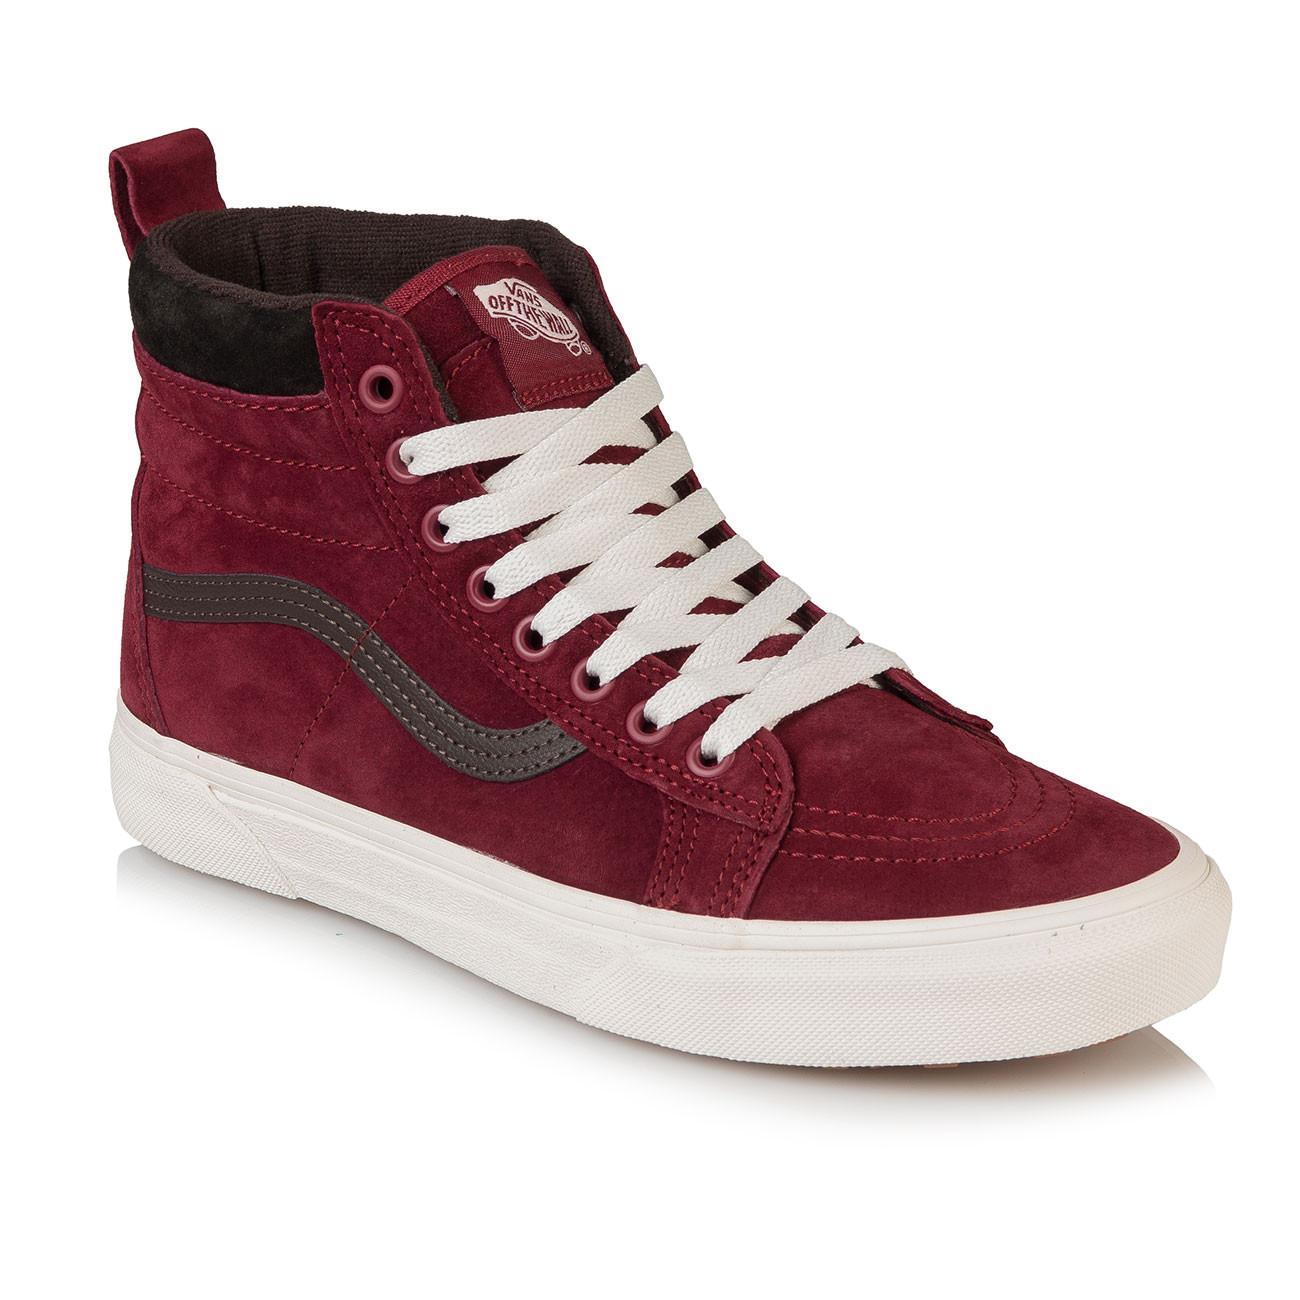 Winter shoes Vans Sk8-Hi MTE biking red